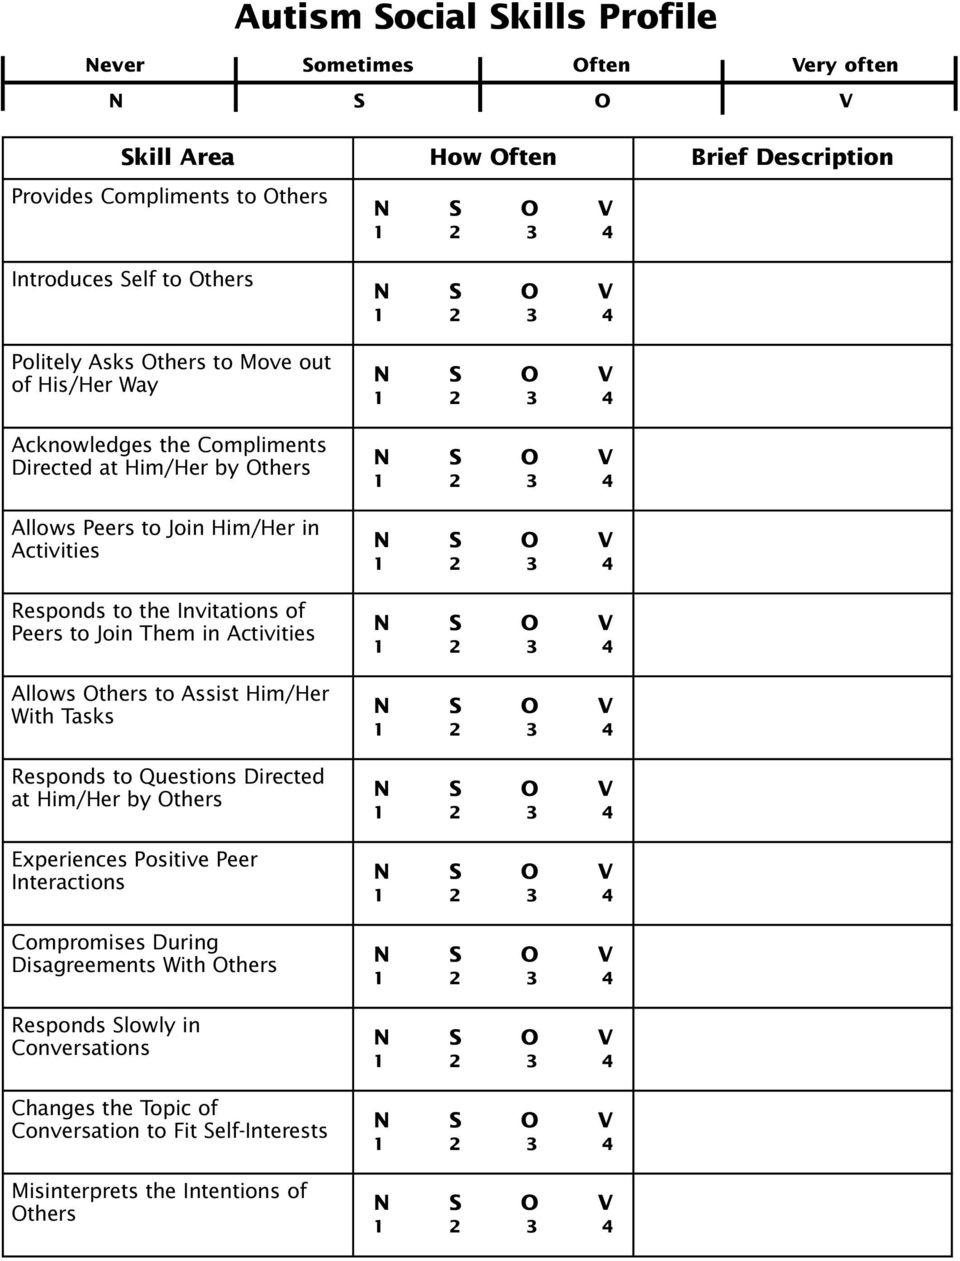 Autism Social Skills Profile  Pdf Free Download inside Autism Social Skills Profile Scoring